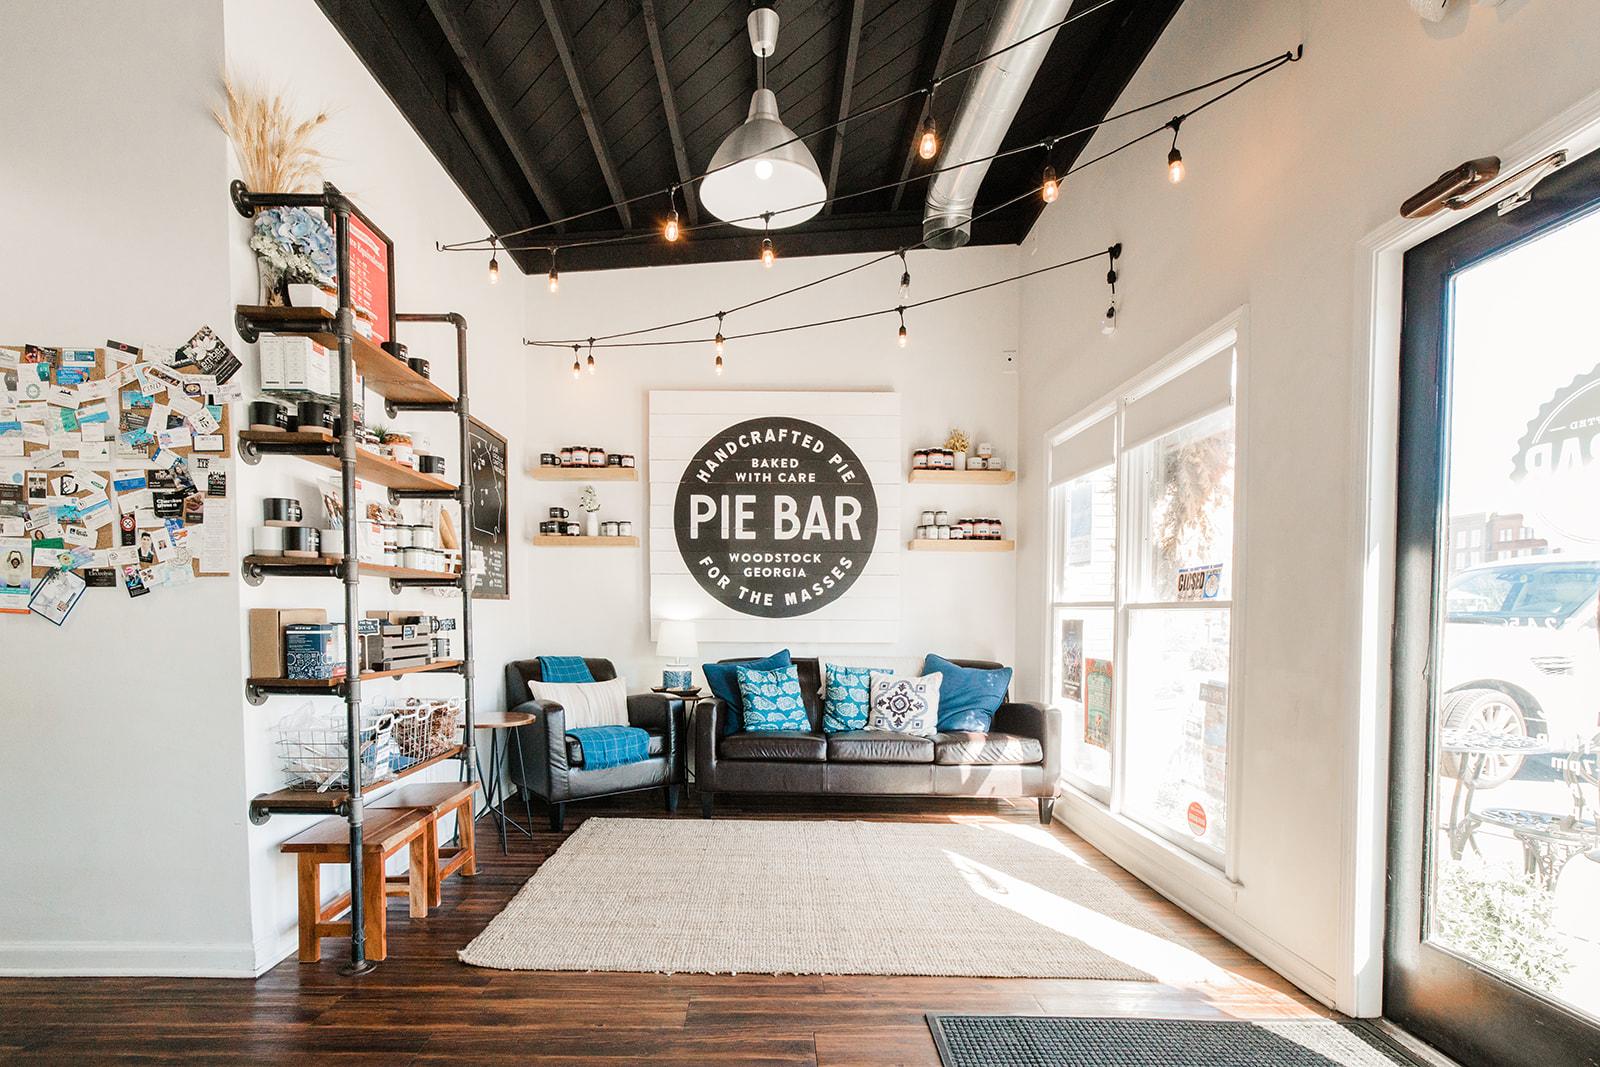 Pie Bar Woodstock